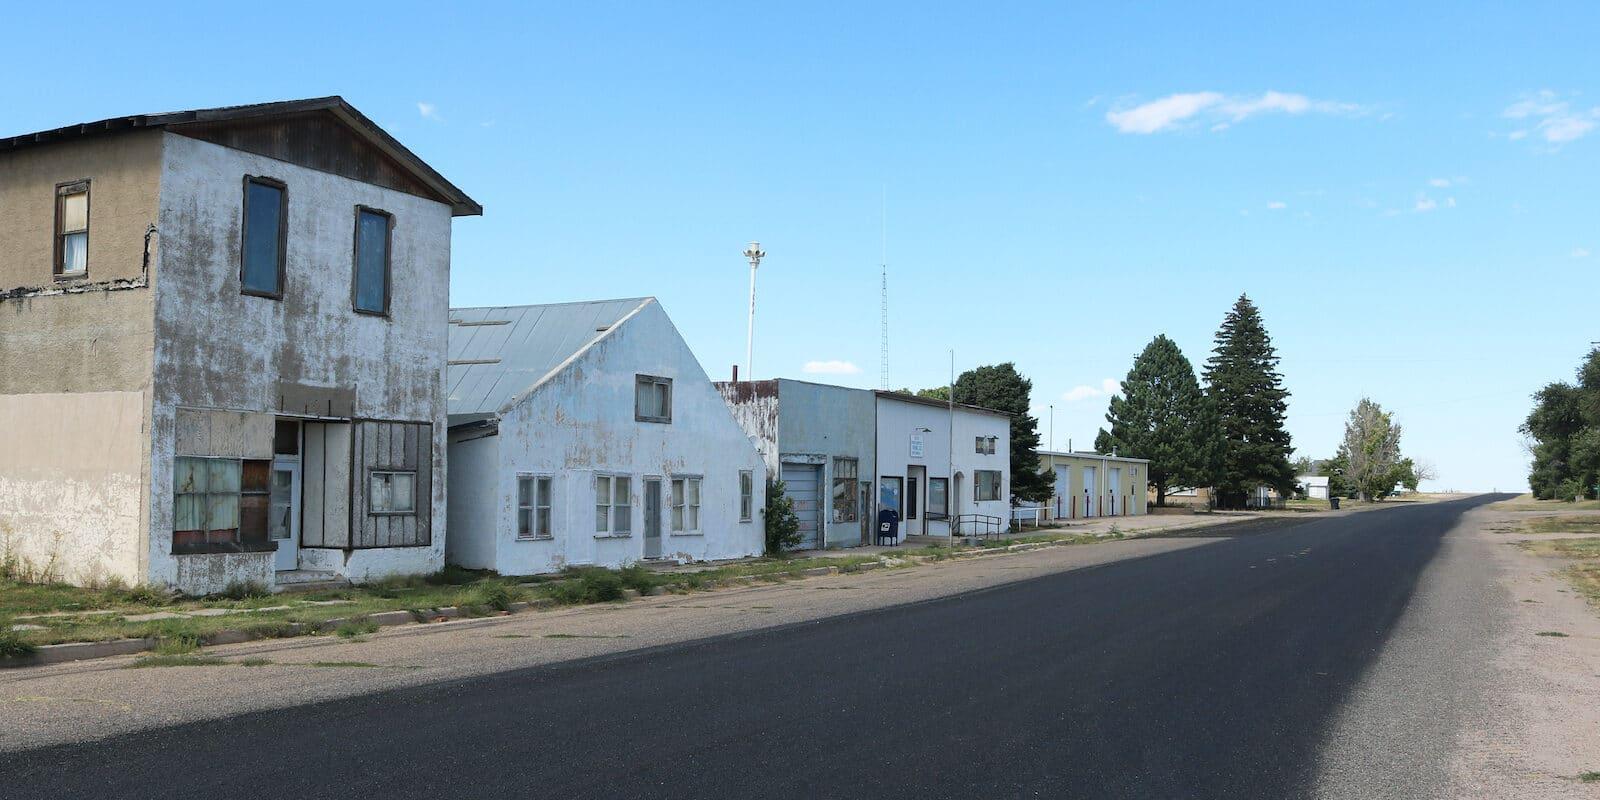 Vona Colorado 1st Avenue